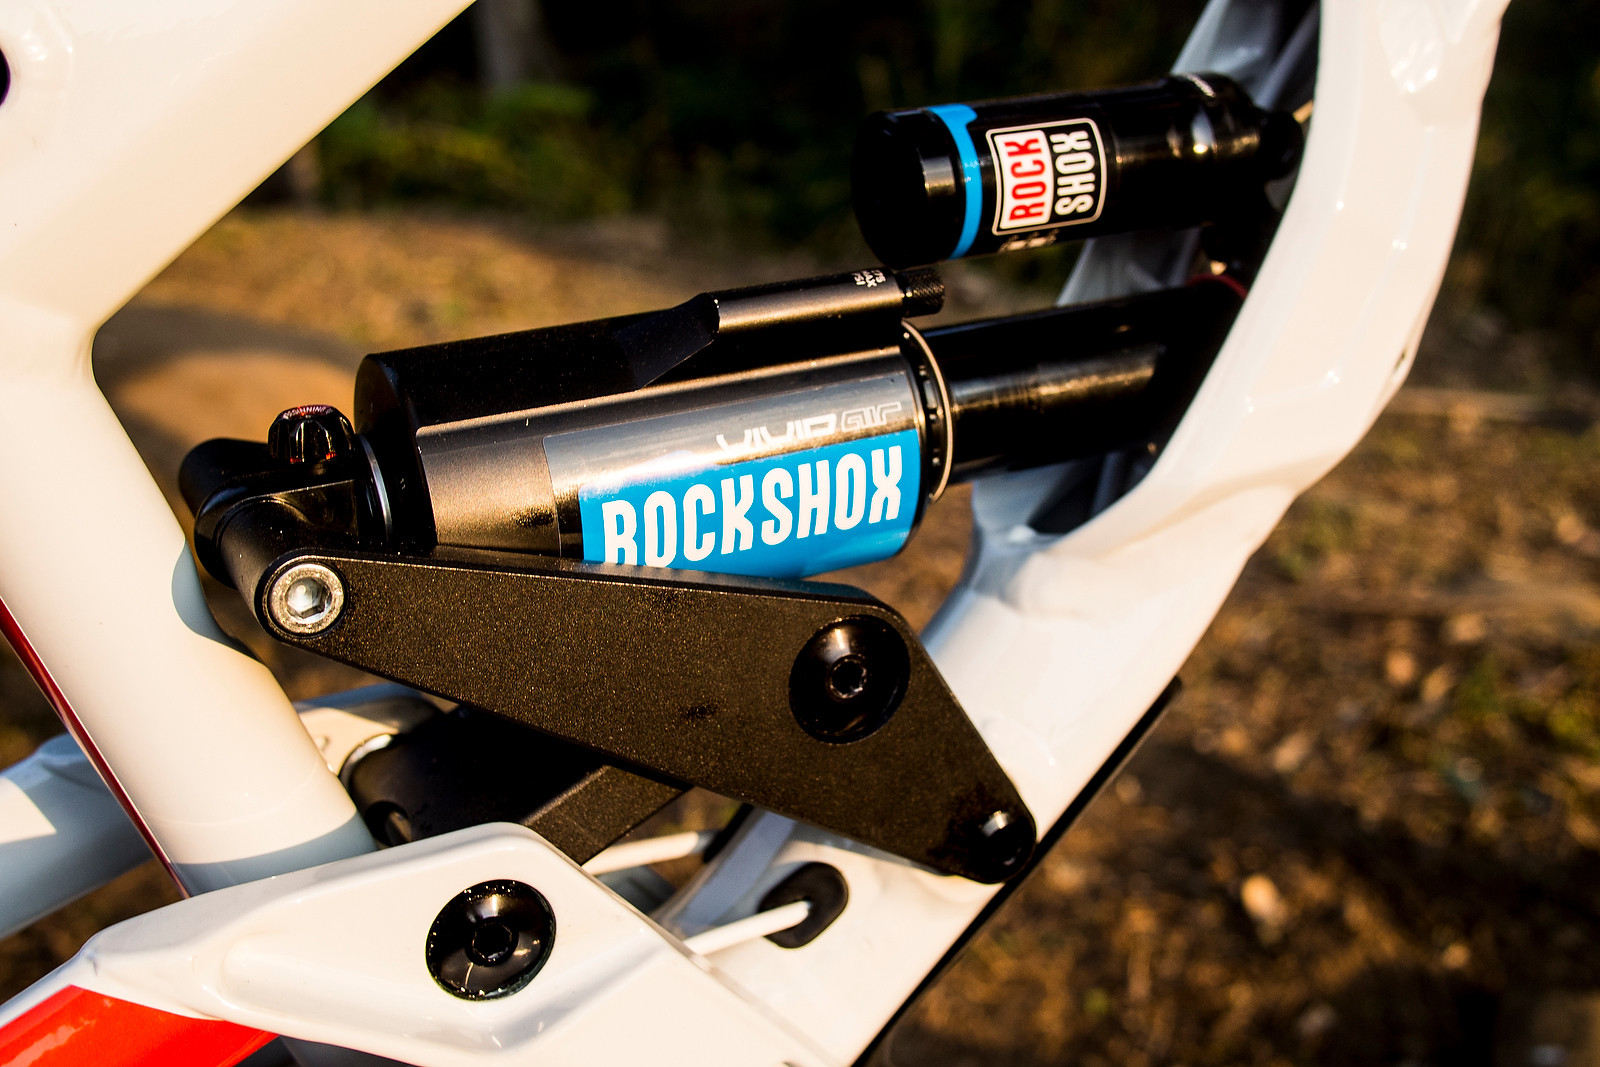 RockShox Vivid Air on Emmeline Ragot's World Champs Bike - WORLD CHAMPS BIKE - Emmeline Ragot's Lapierre DH 720 - Mountain Biking Pictures - Vital MTB